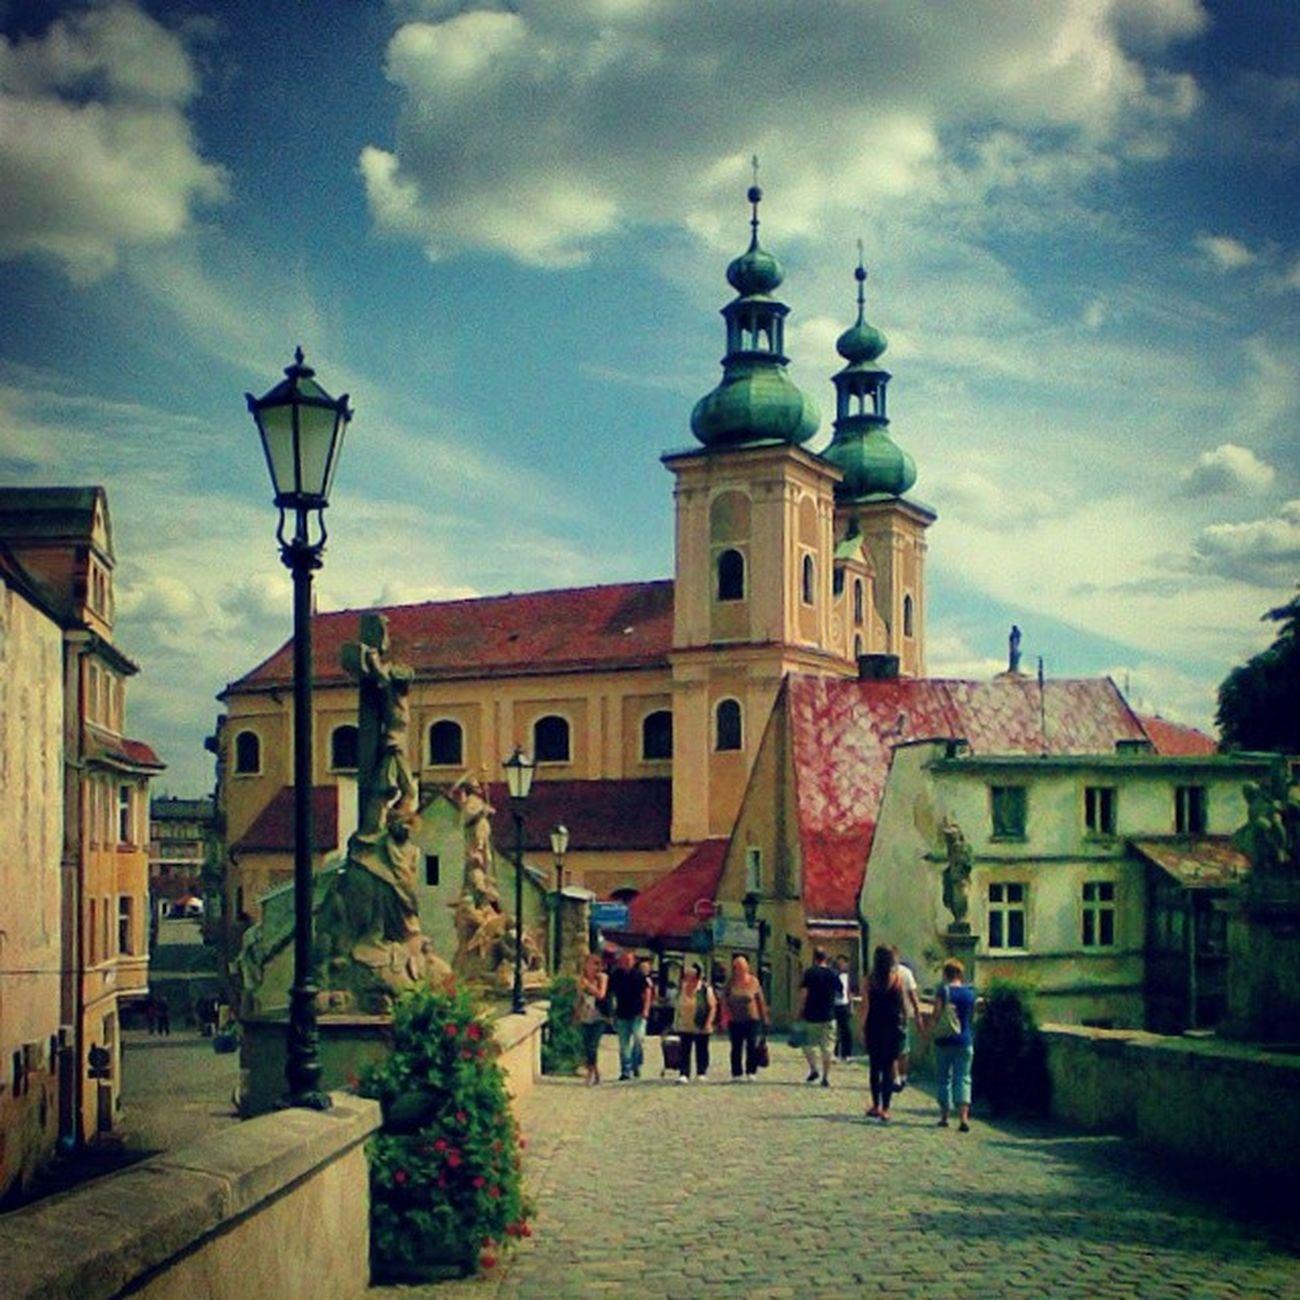 Klodzk Dolnyslask Poland Polska europetraveltravellingtravelingtravelertravellertouristtourismtravelgramtravelphotoinstatravelphototravelcity_exploreglobal_familychurchtemplebuldingspolandjourneyarchitecture